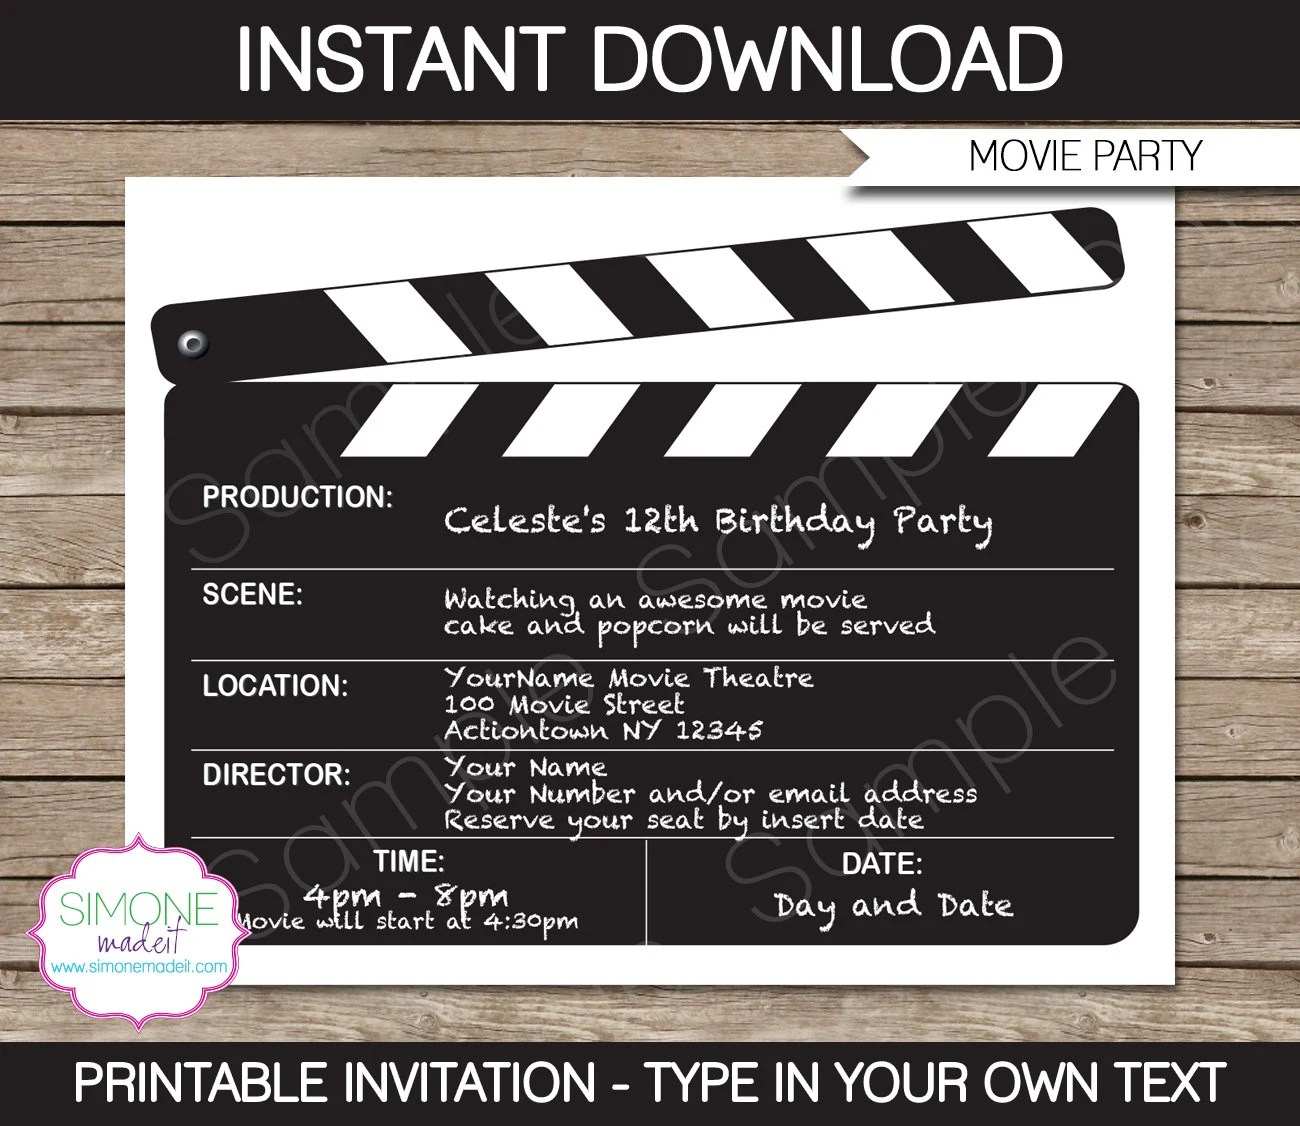 Movie Invitation Template - Movie Night - Birthday Party - INSTANT